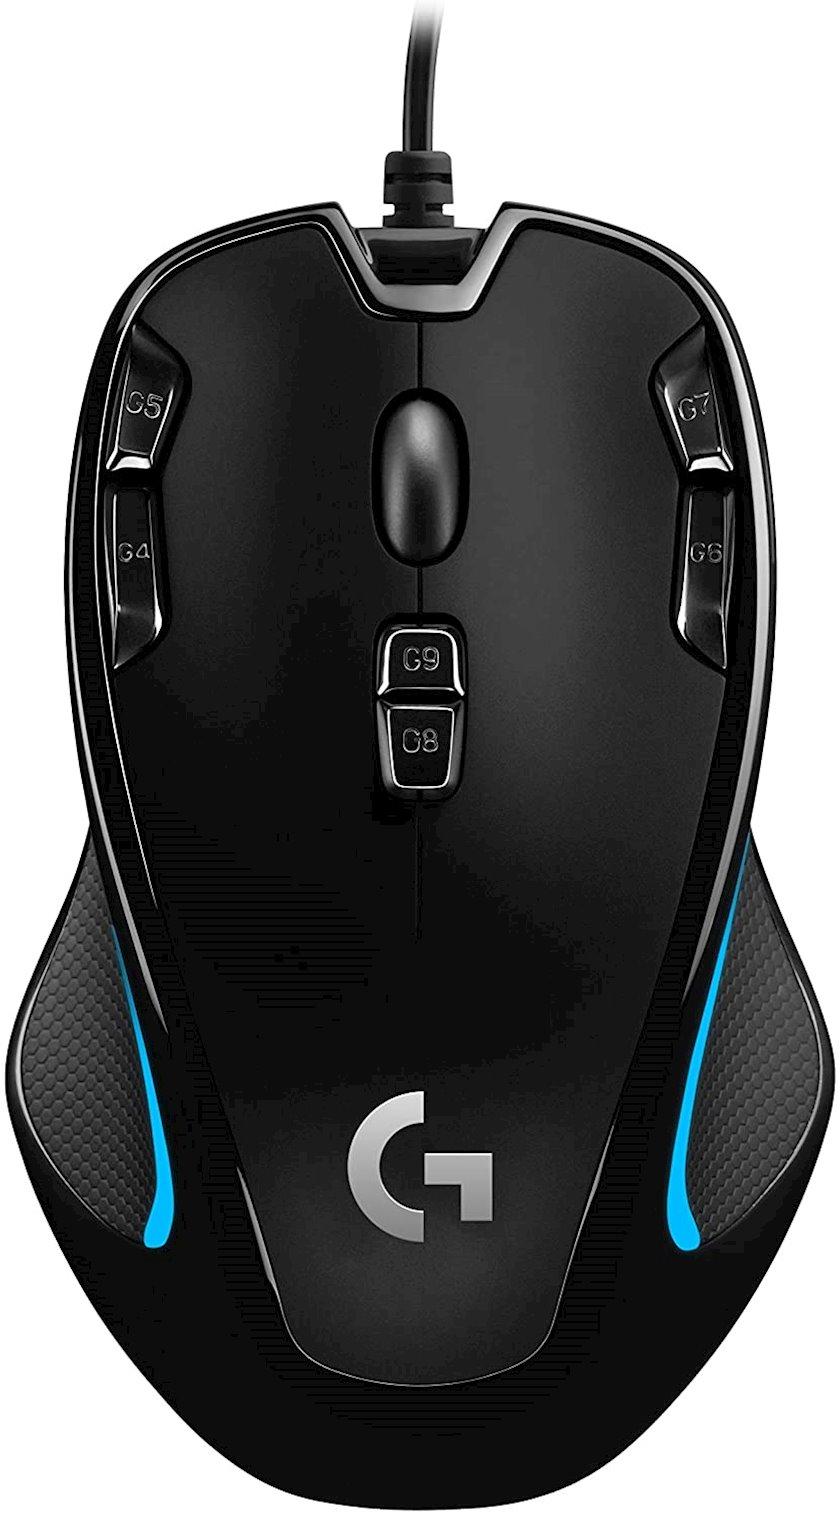 Kompüter siçanı Logitech Gaming Mouse G300s